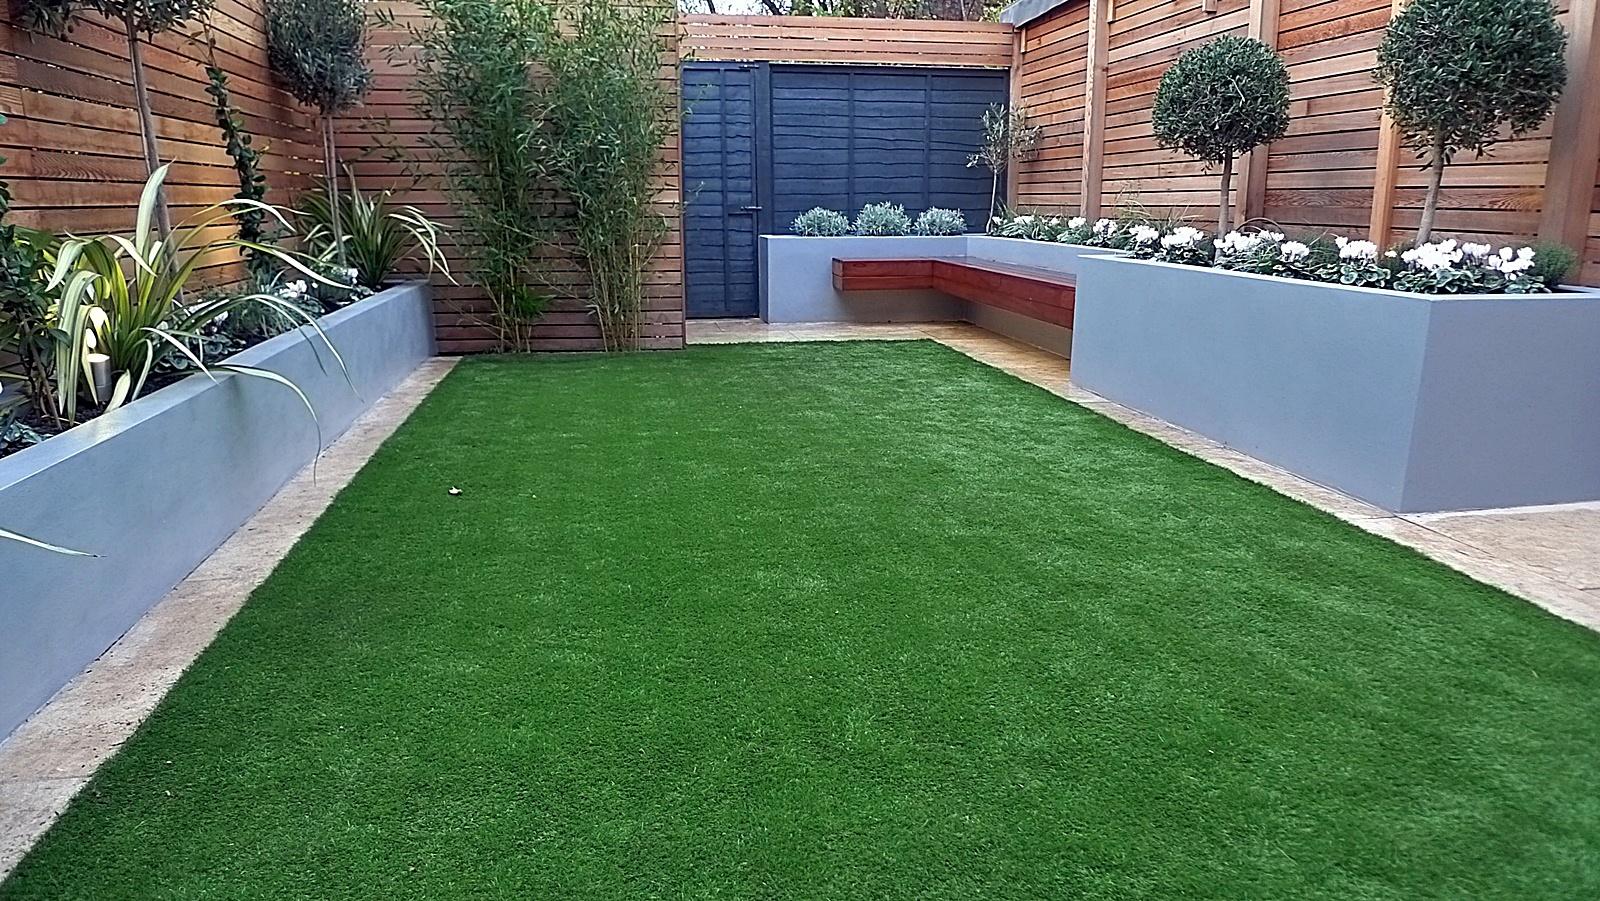 Cedar Screen Topiary Fake Grass Formal Privacy Fence London Chelsea Design Fulham Garden Modern Streatham London Garden Design